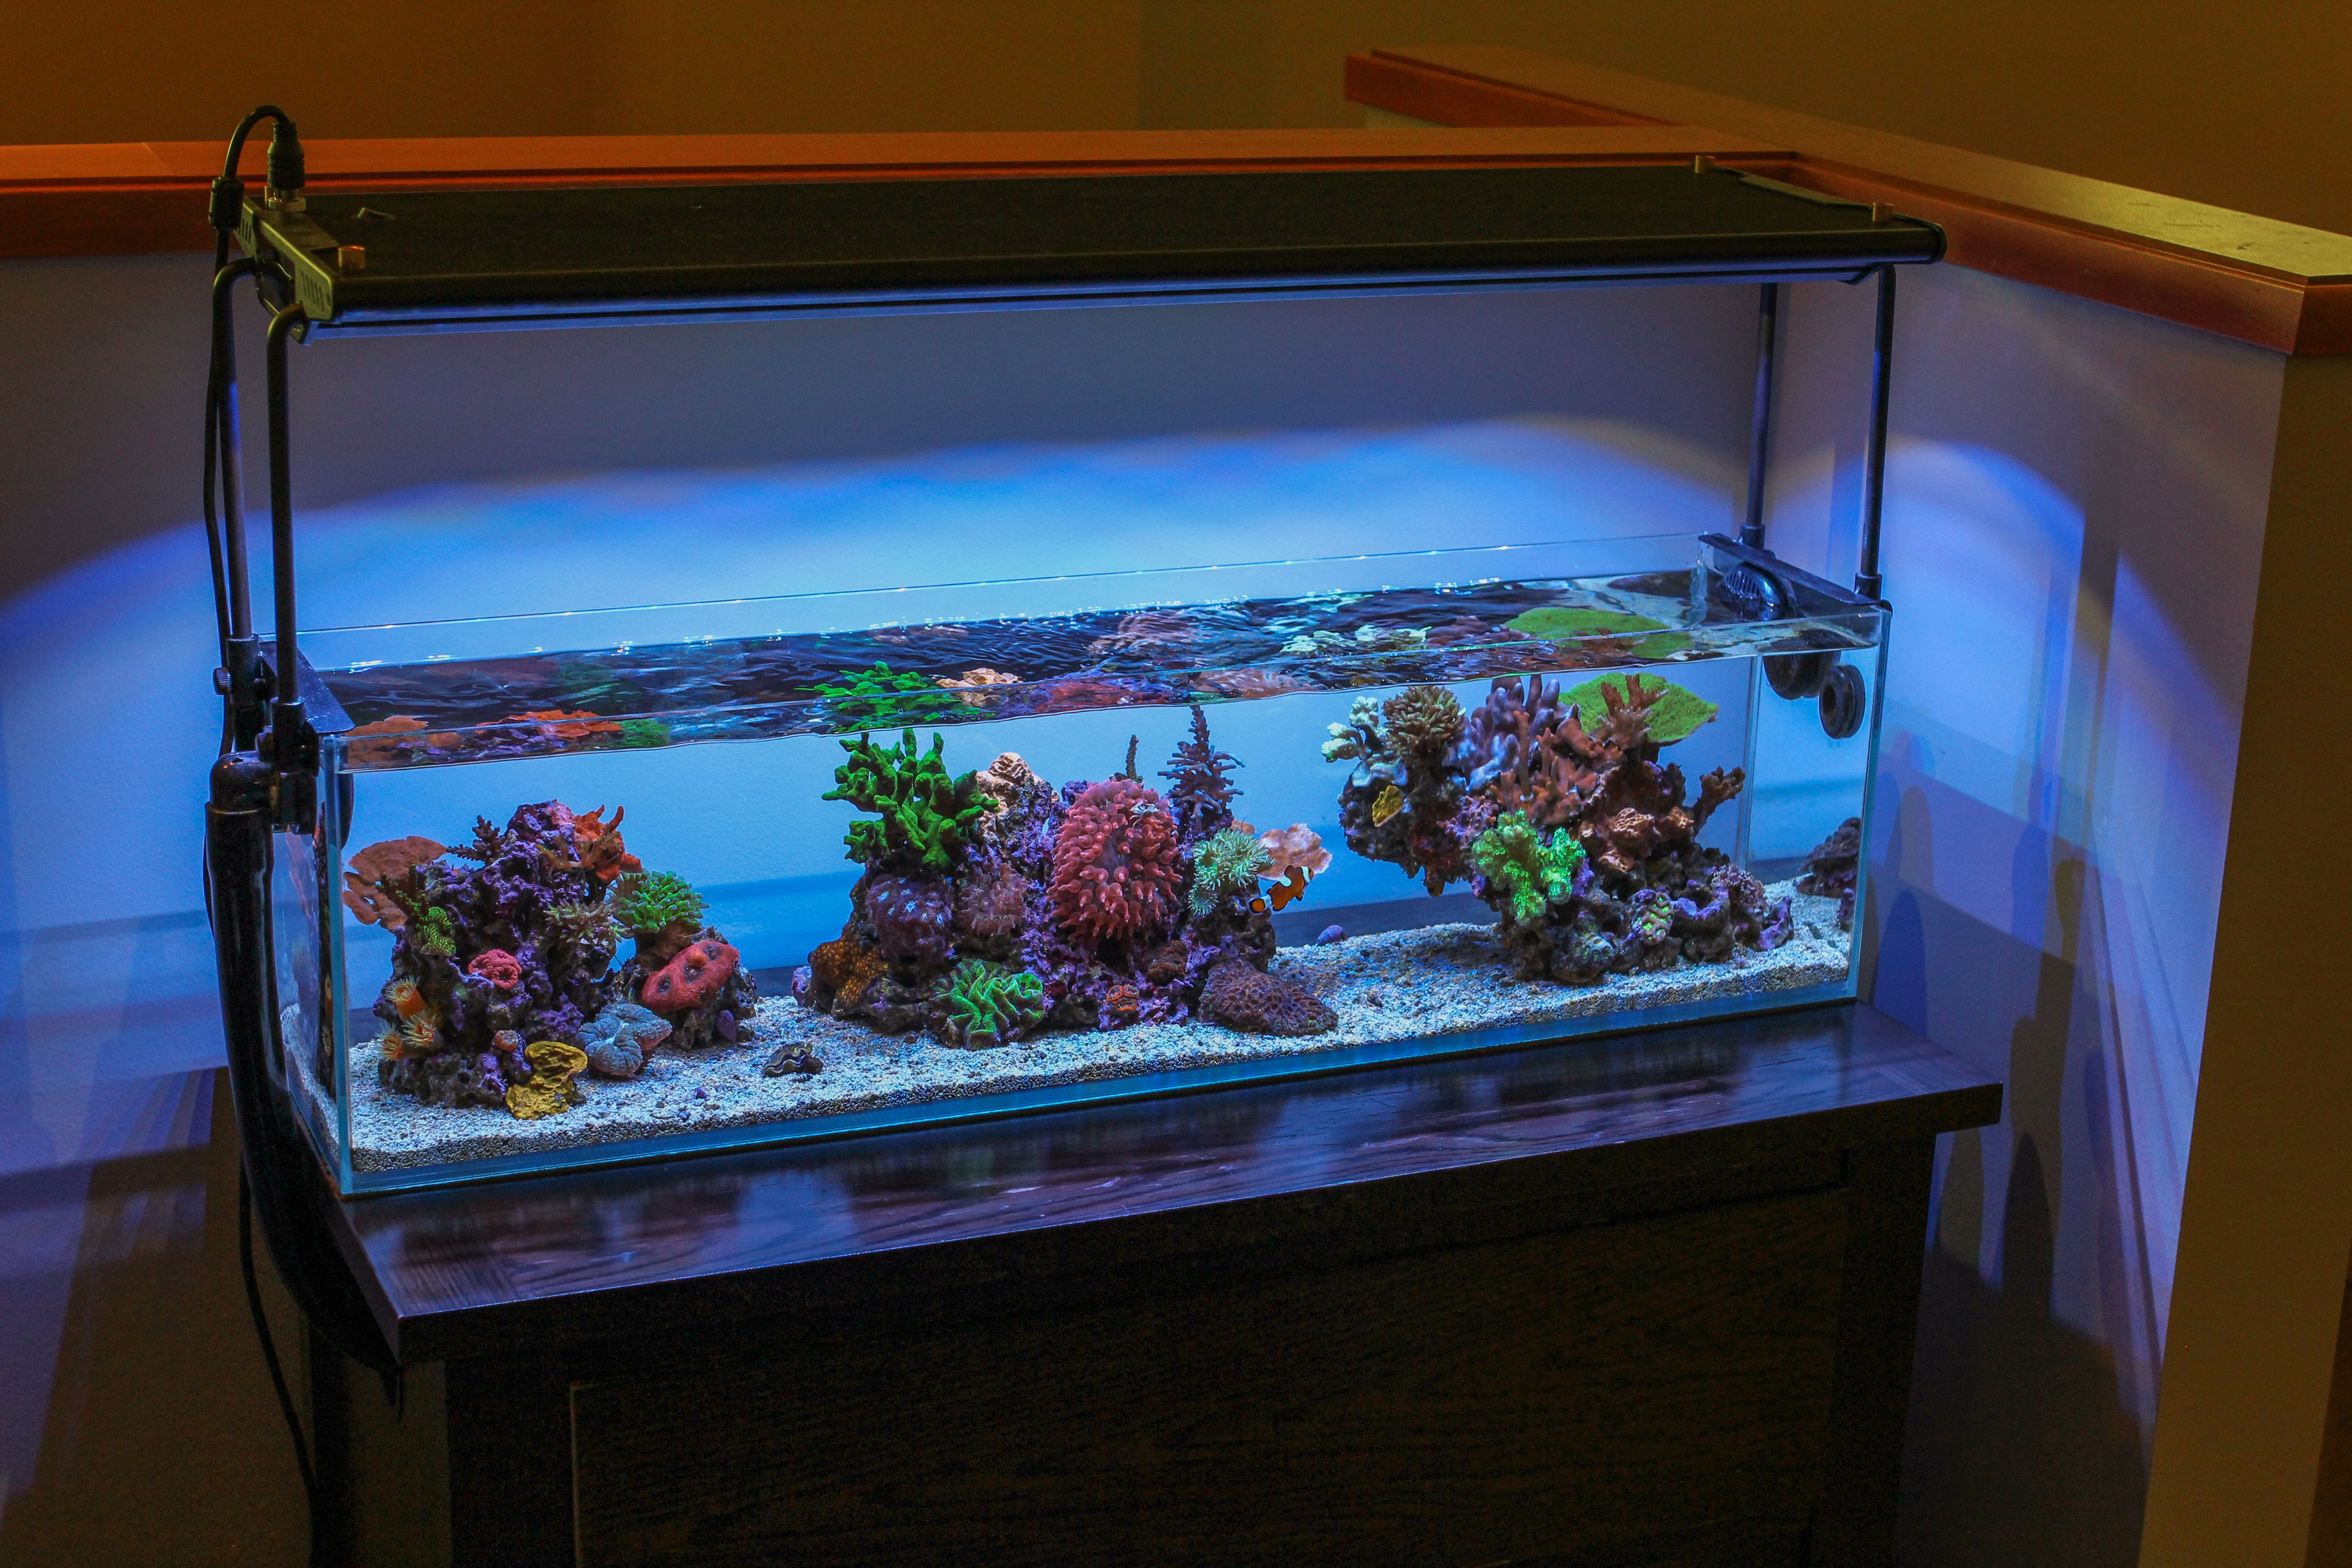 3 foot office nano reef2reef saltwater and reef aquarium. Black Bedroom Furniture Sets. Home Design Ideas